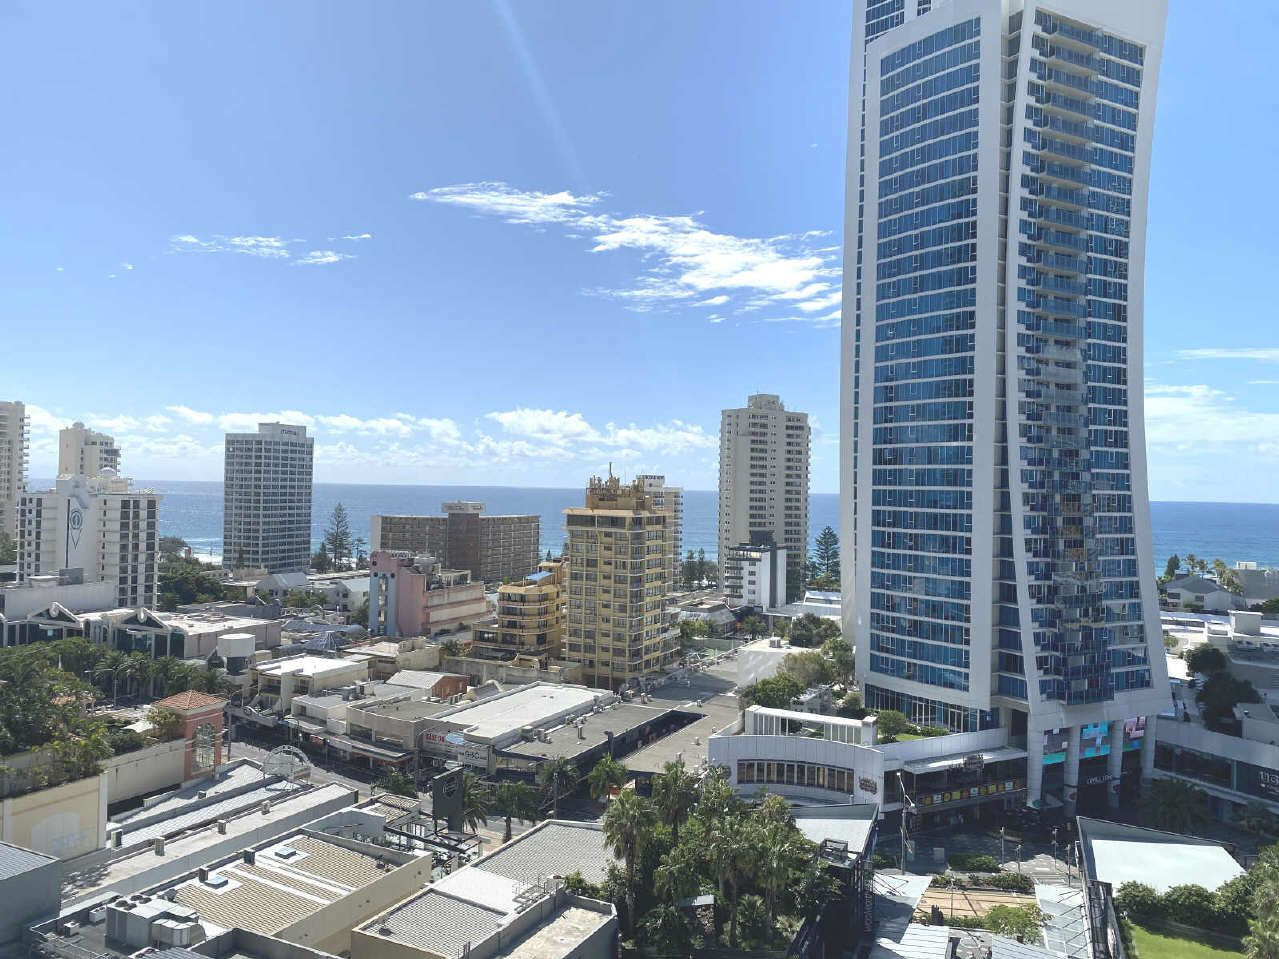 1131, Mantra Circle On Cavill 9 Ferny Avenue, Surfers Paradise QLD 4217, Image 0